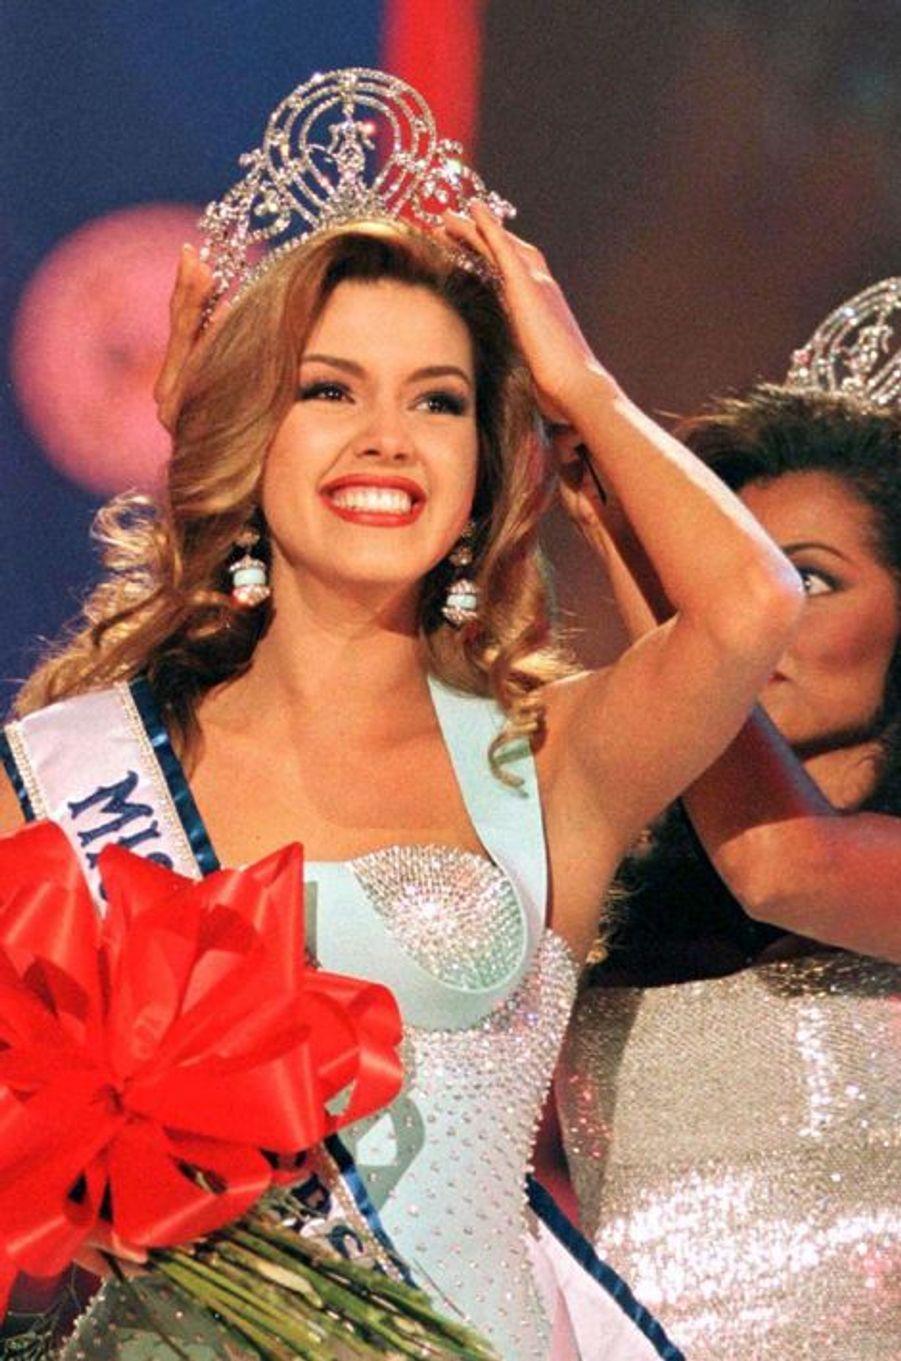 Alicia Machado, Miss Venezuela élue Miss Univers en 1996